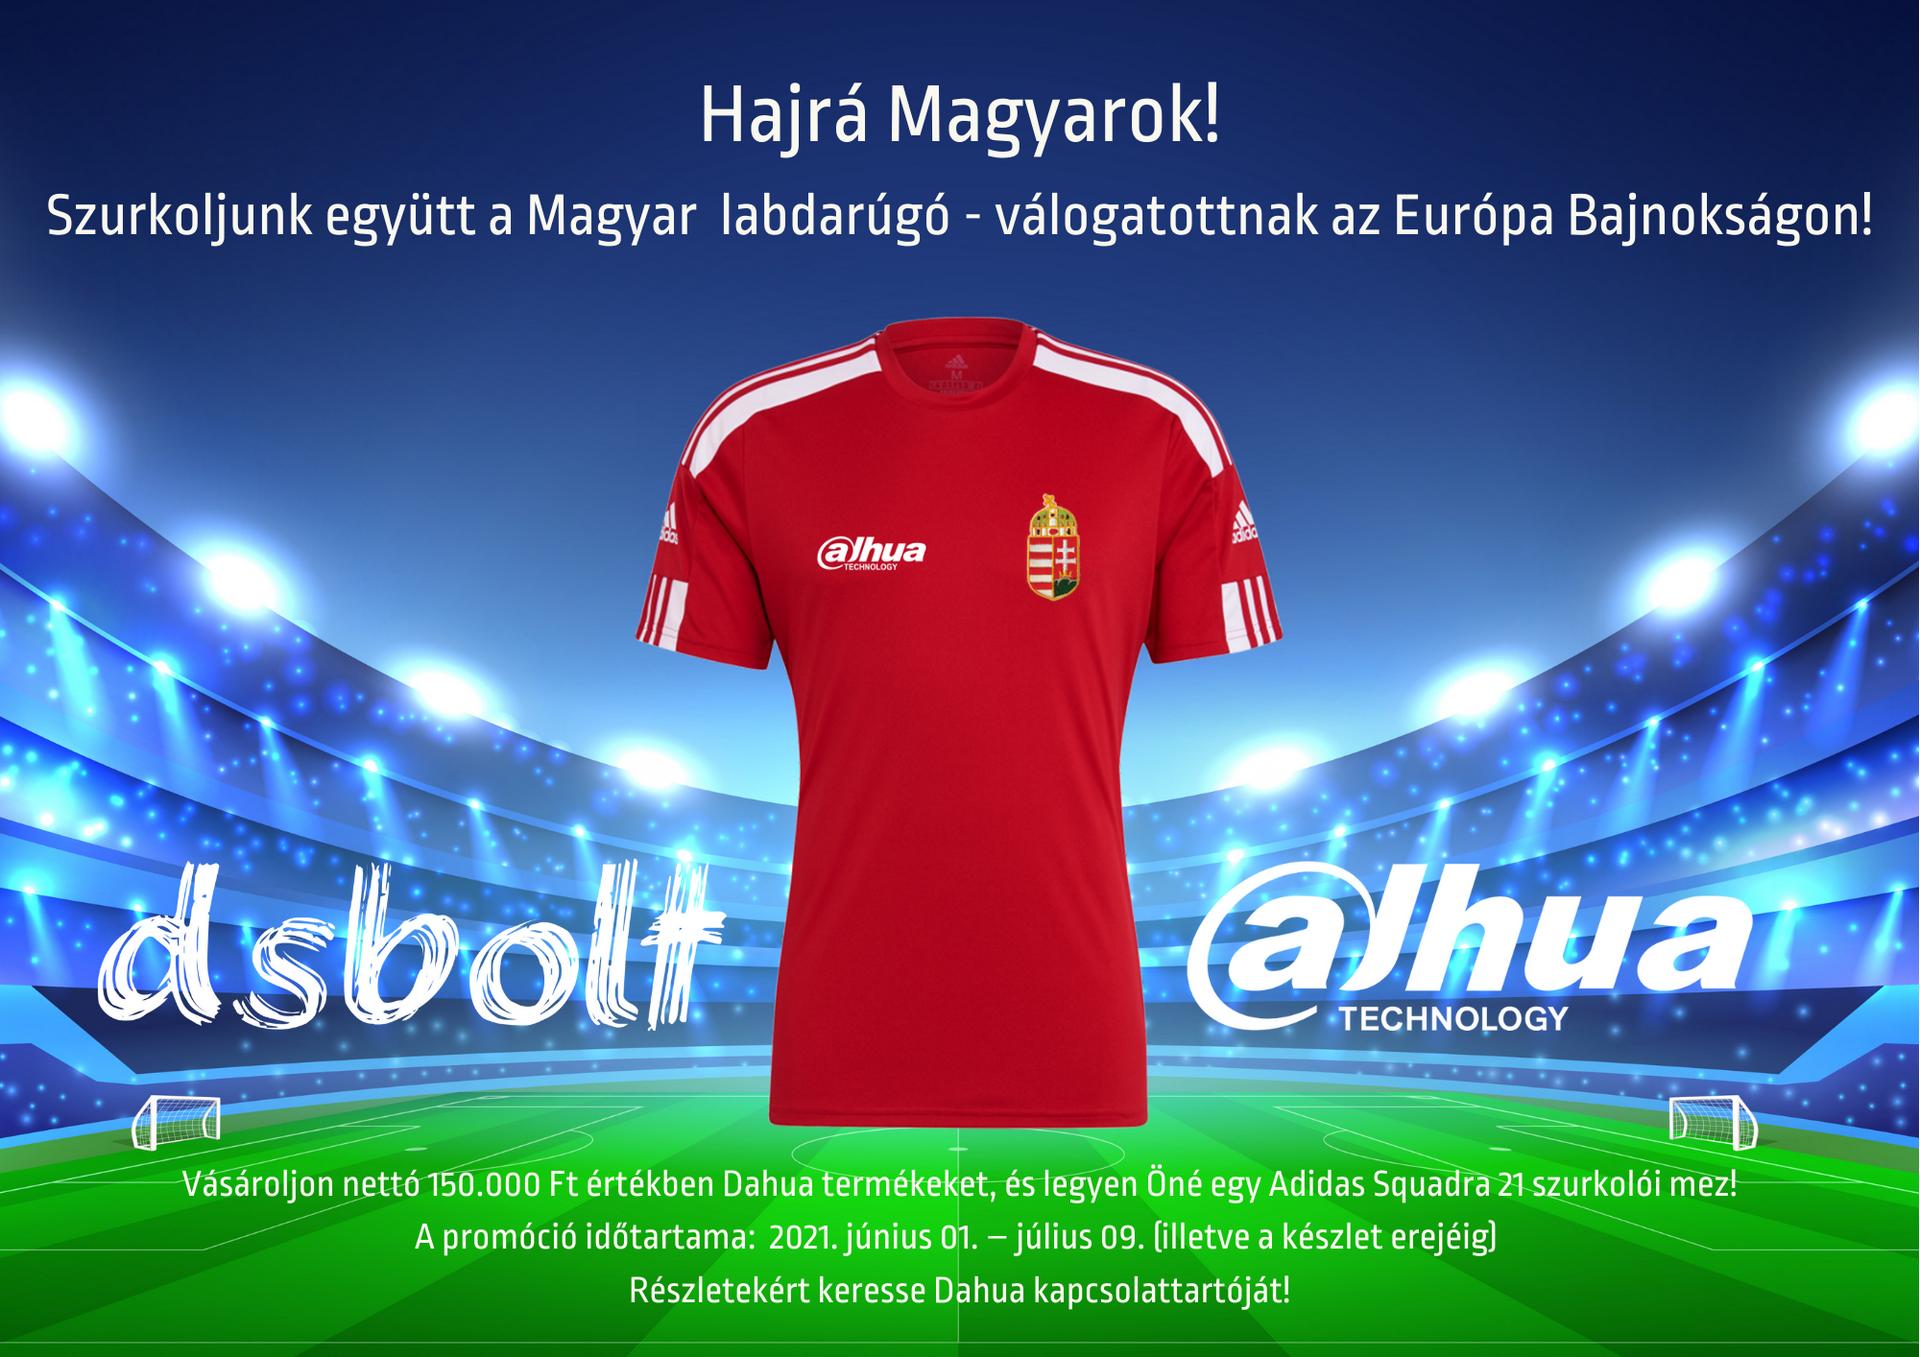 Hajrá Magyarok!